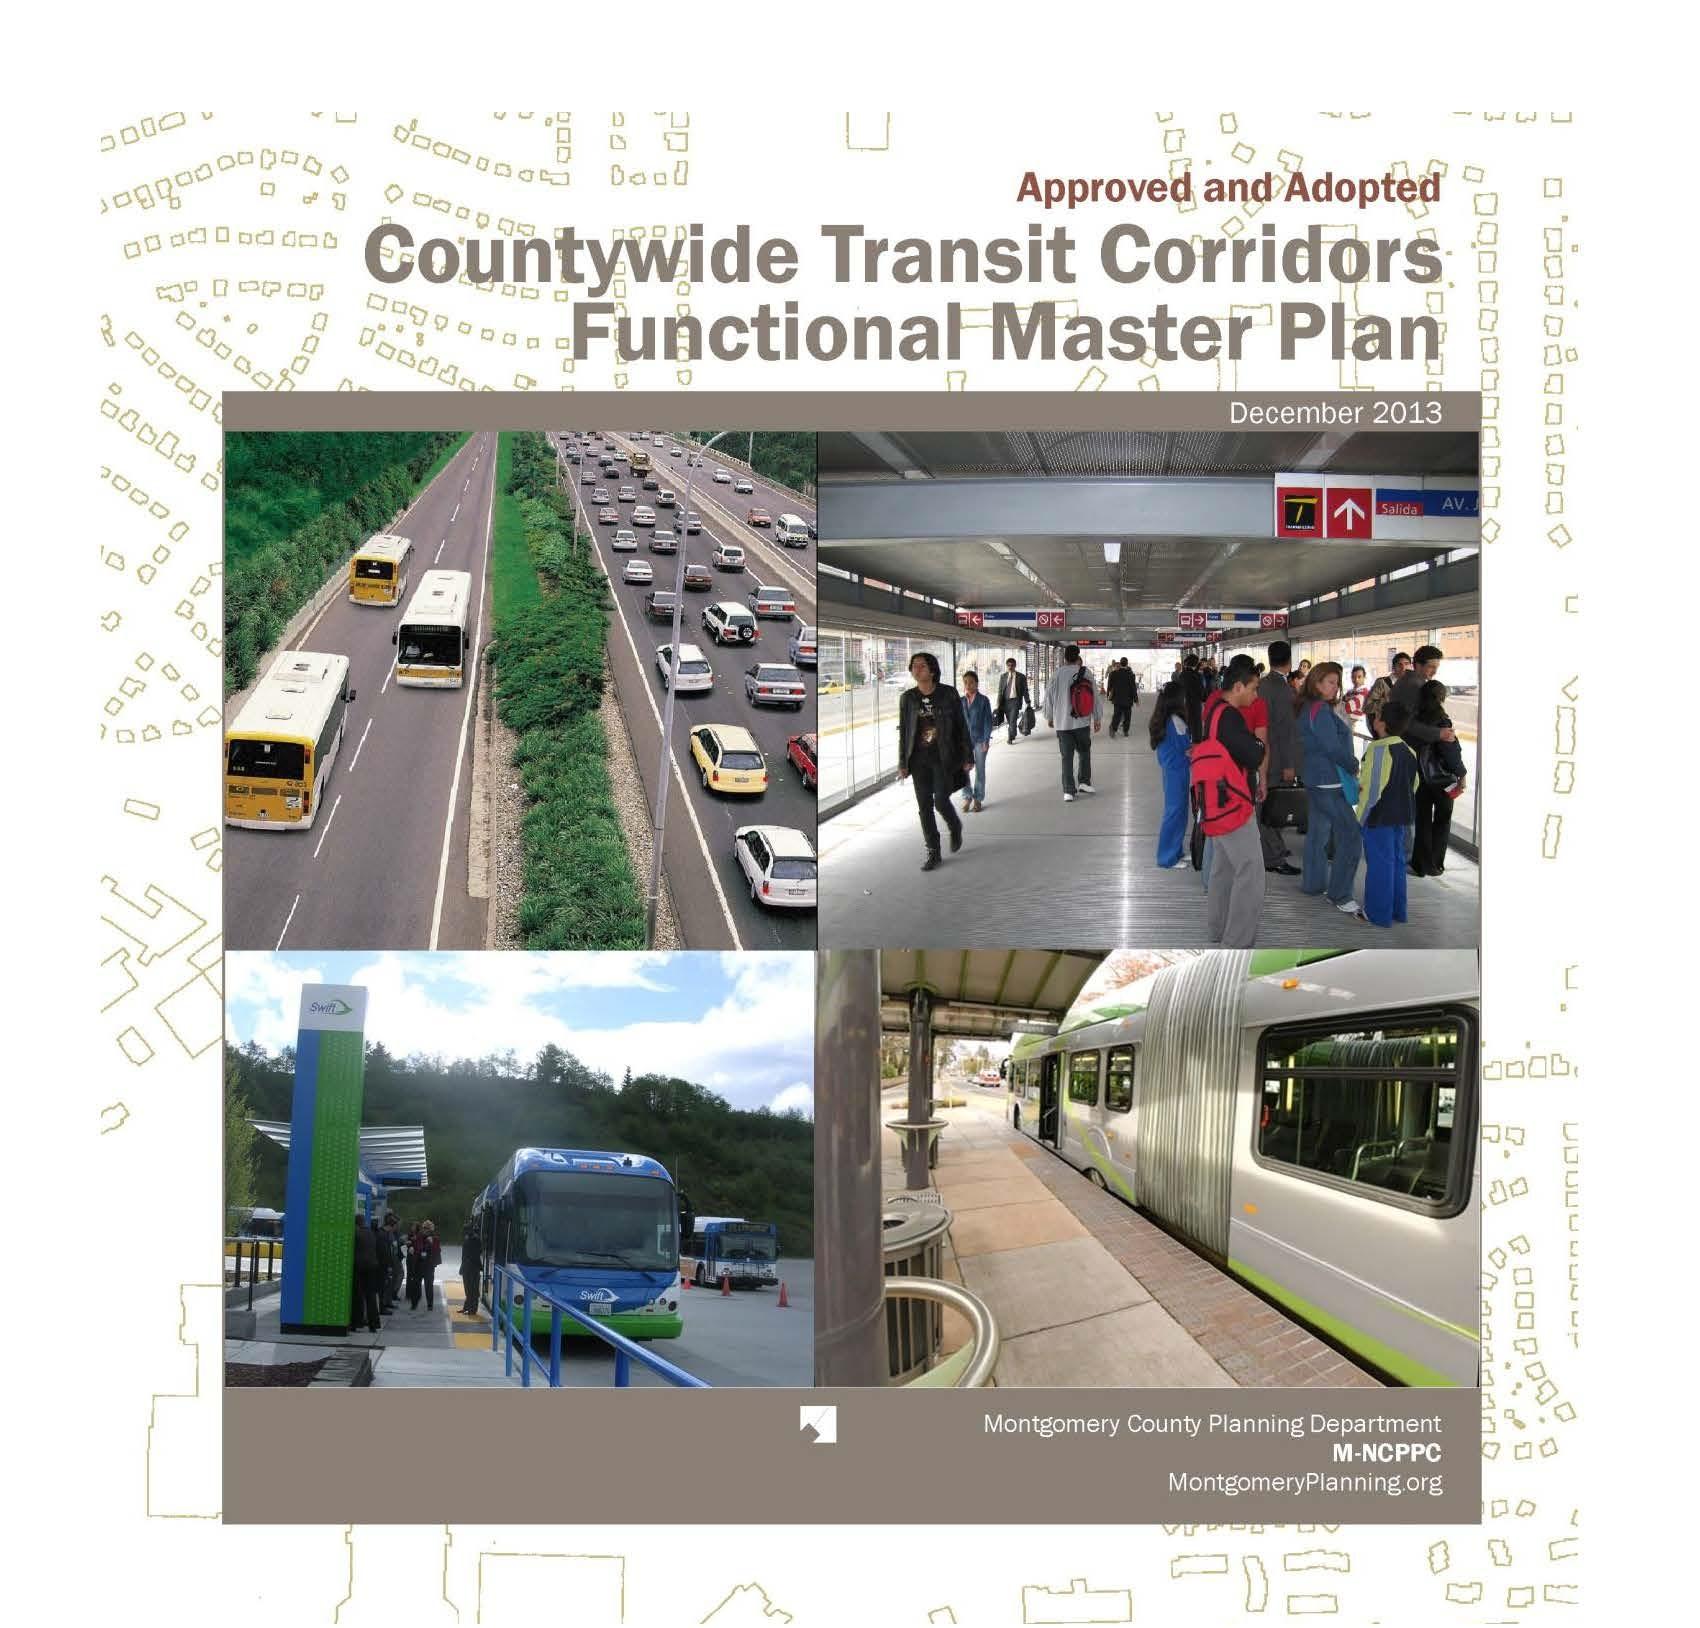 MNCPPC Countywide Transit Corridors Functional Master Plan